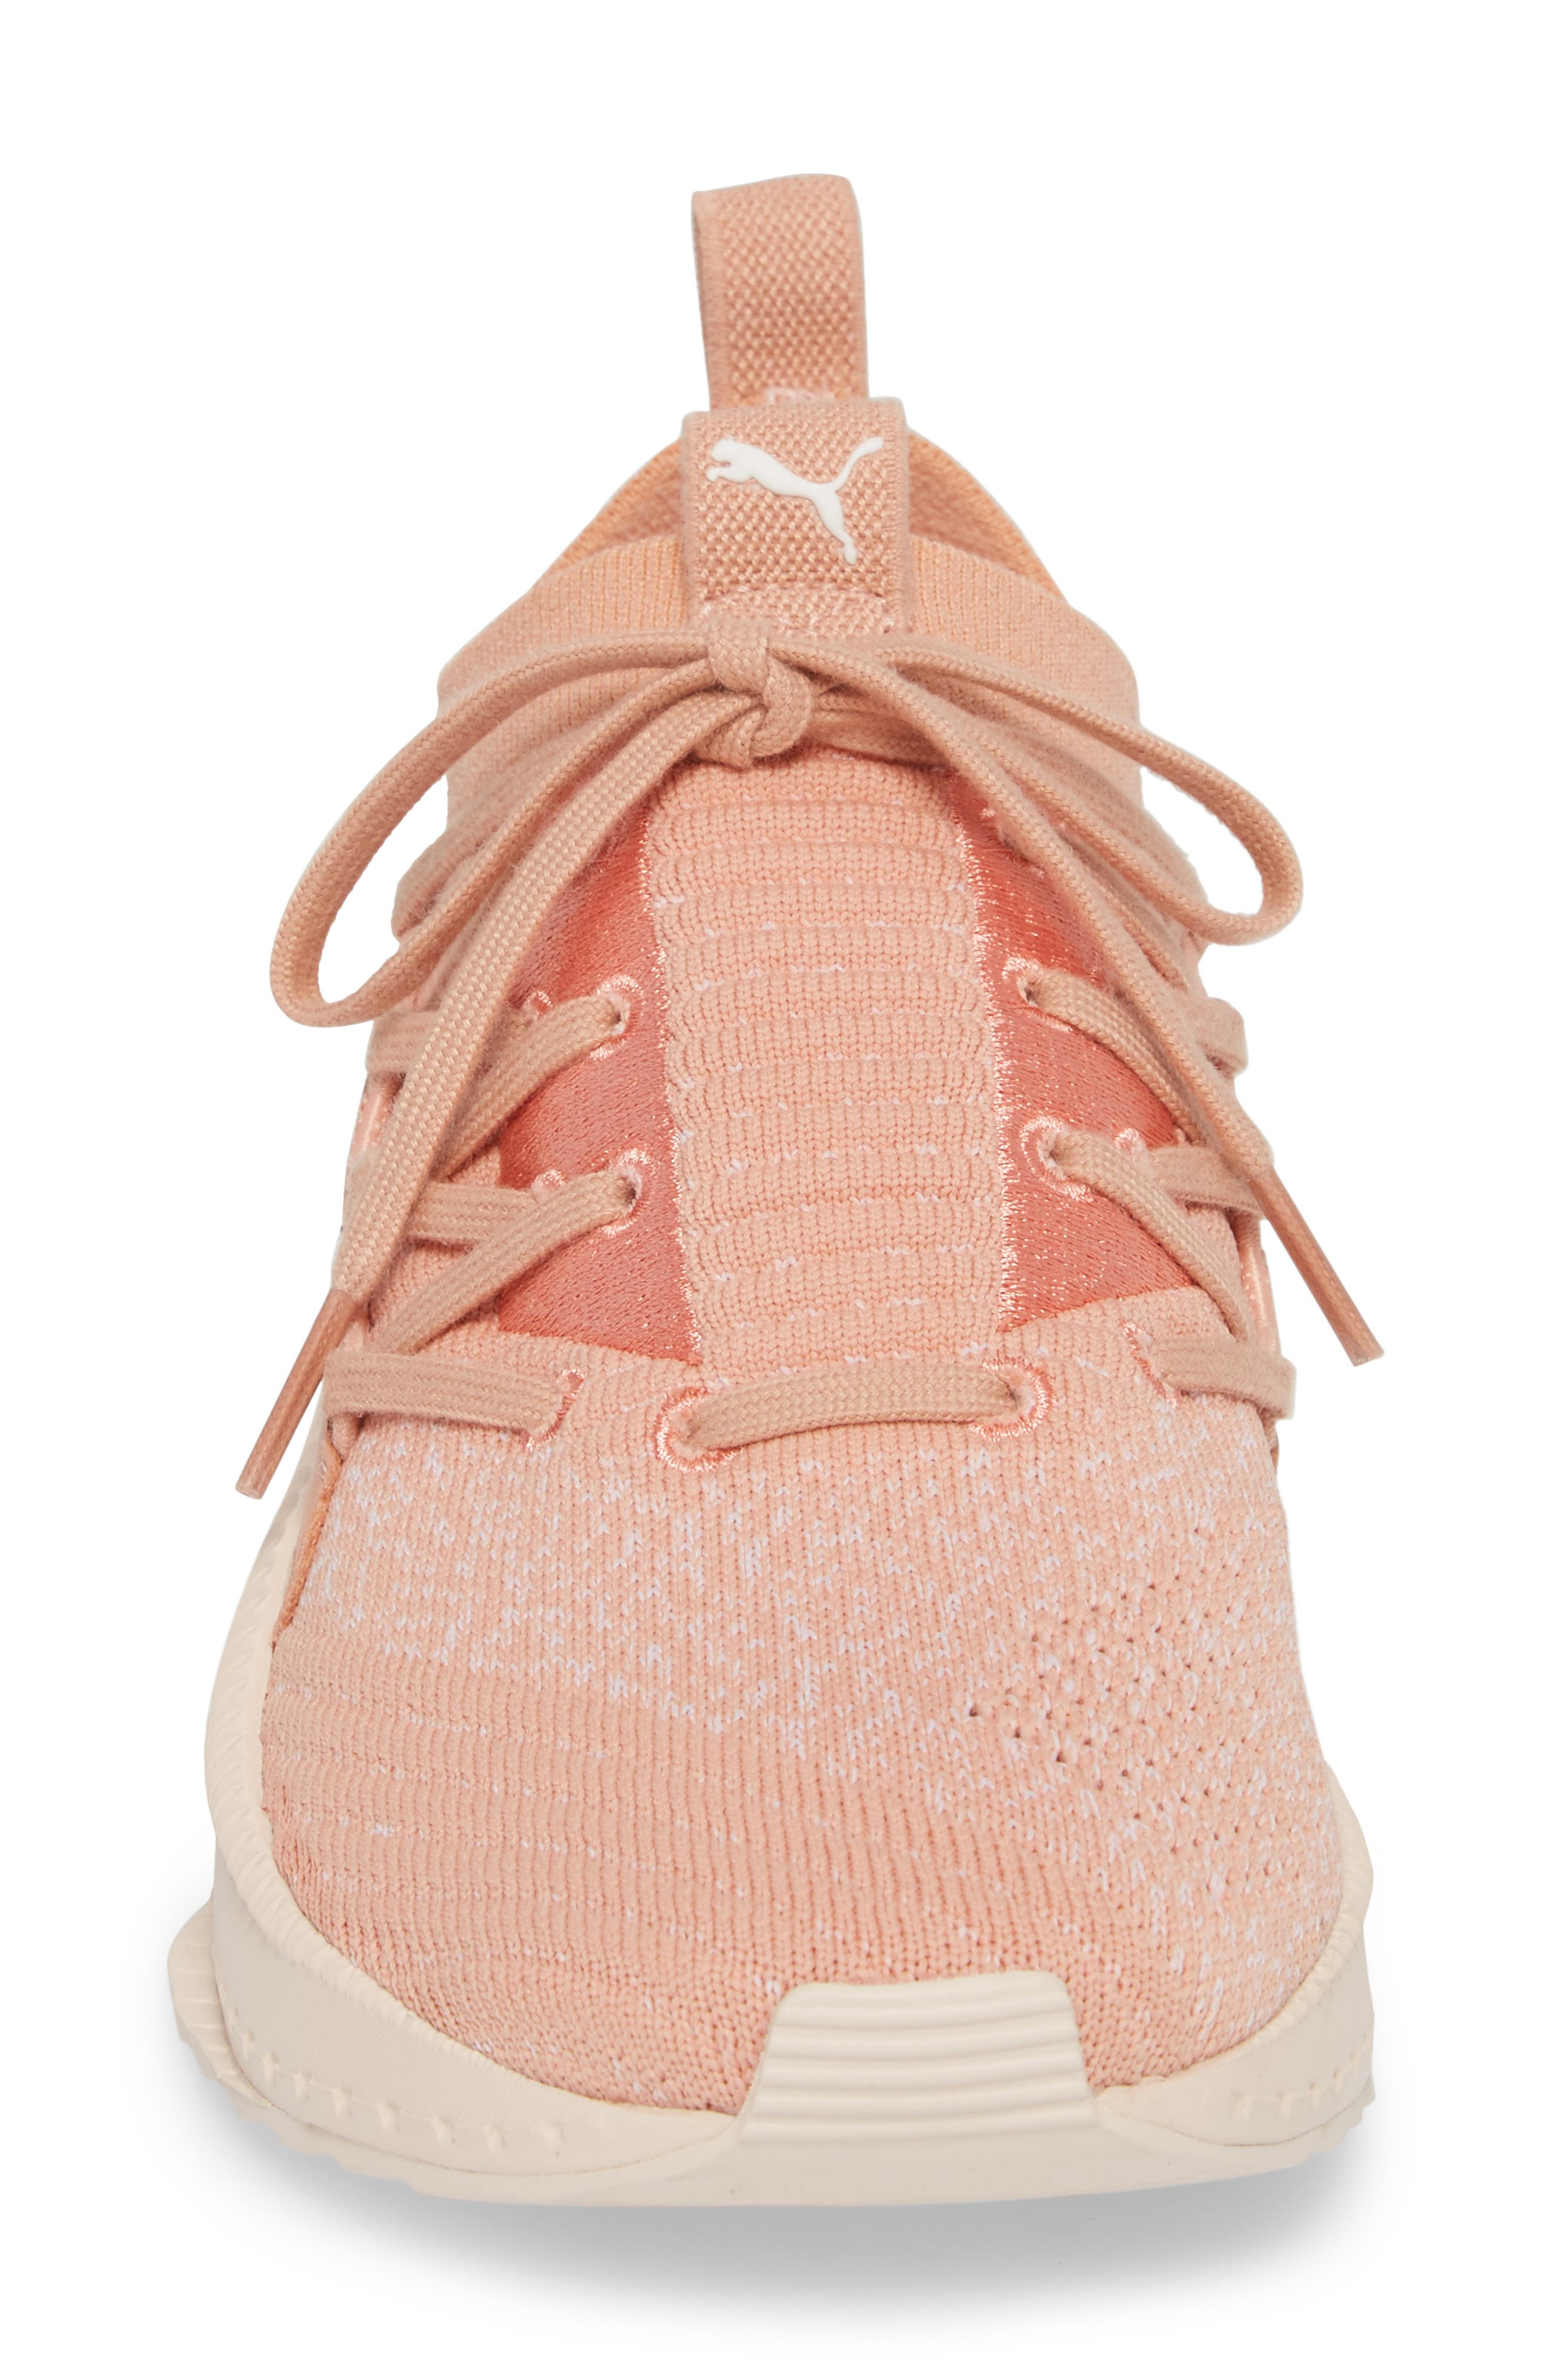 Tsugi Jun Knit Sneaker,                             Alternate thumbnail 4, color,                             Peach Beige/ Puma White/ Pearl